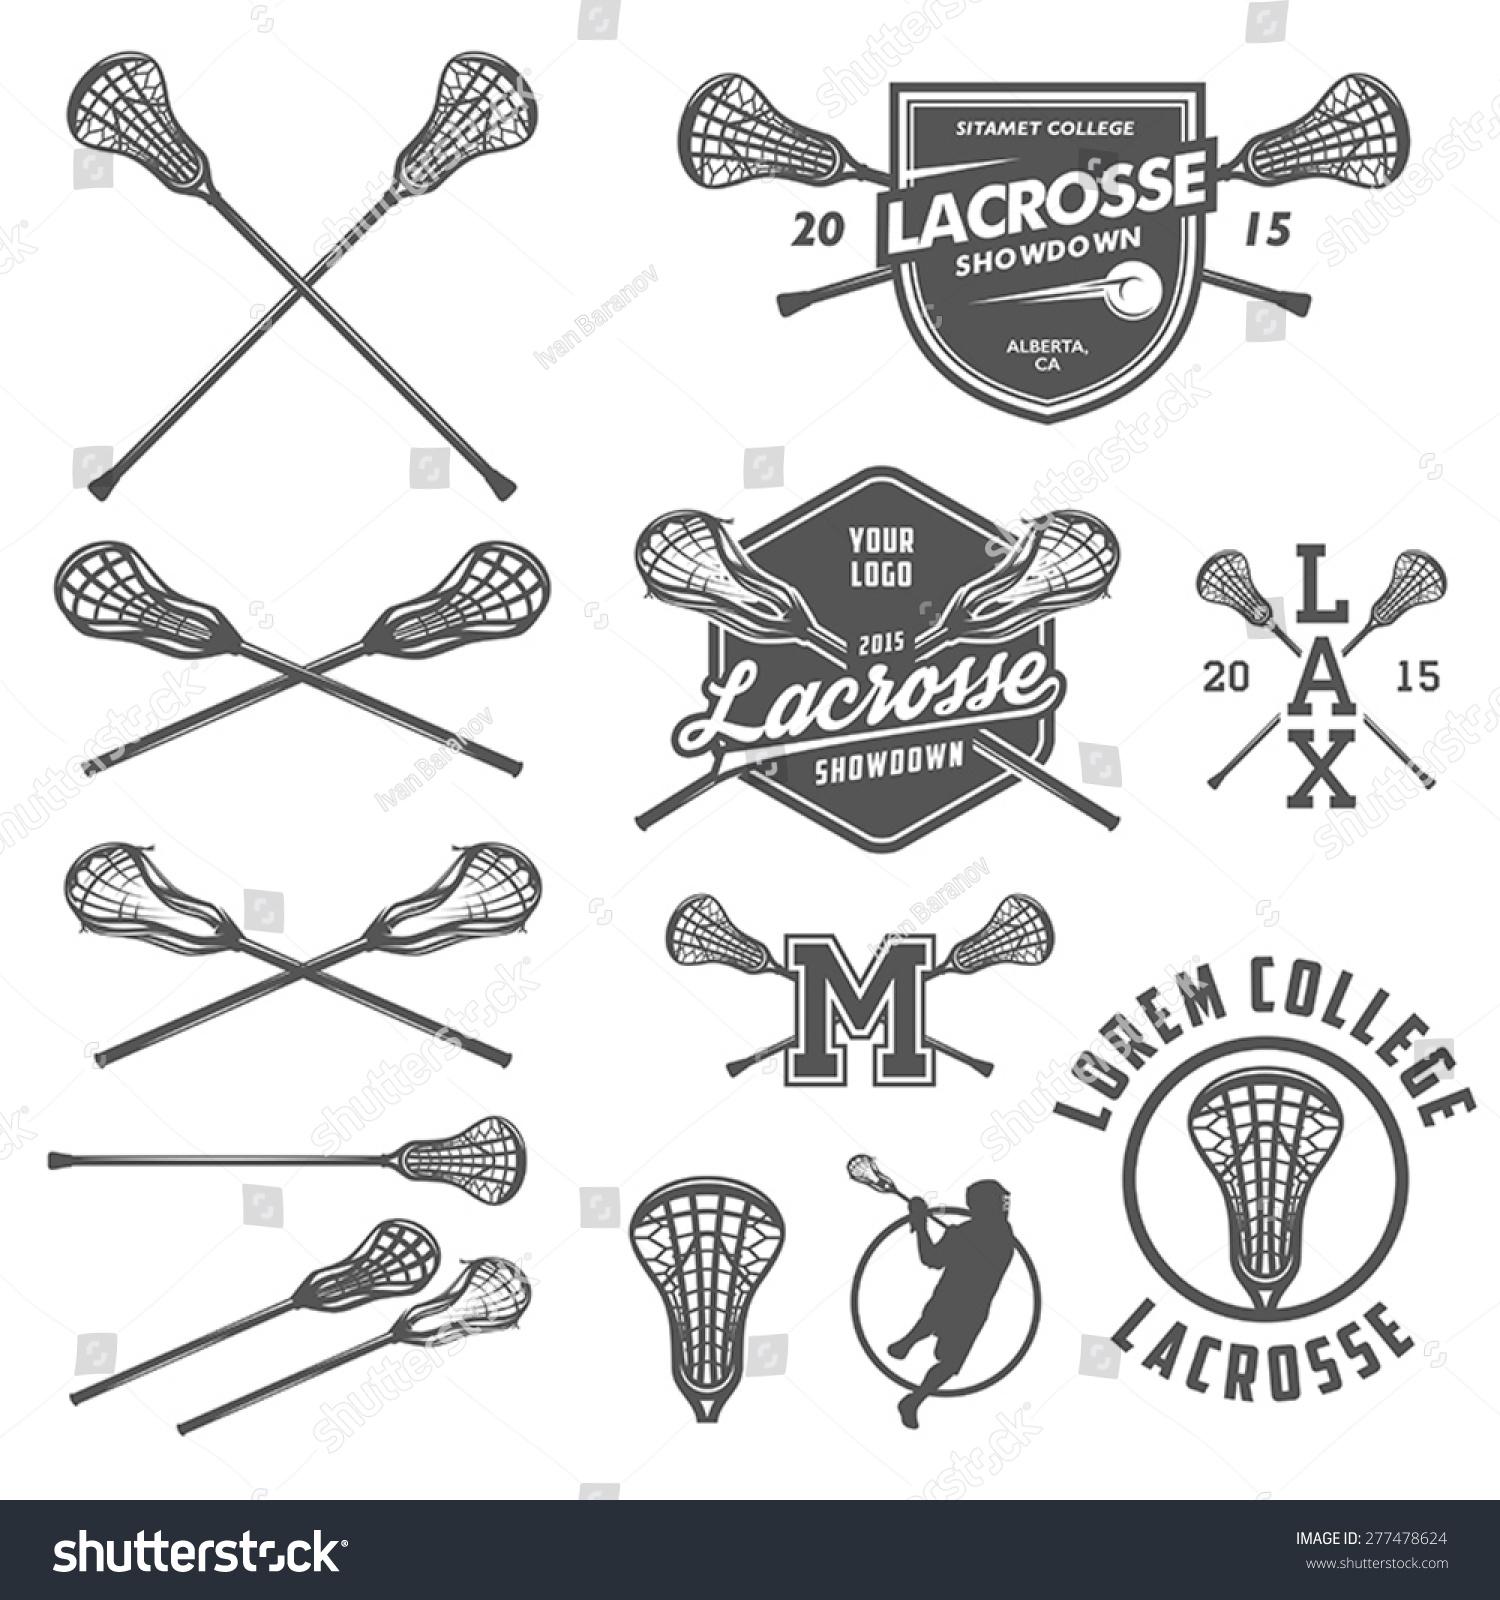 Set Lacrosse Design Elements Stock Vector (Royalty Free) 277478624 ...